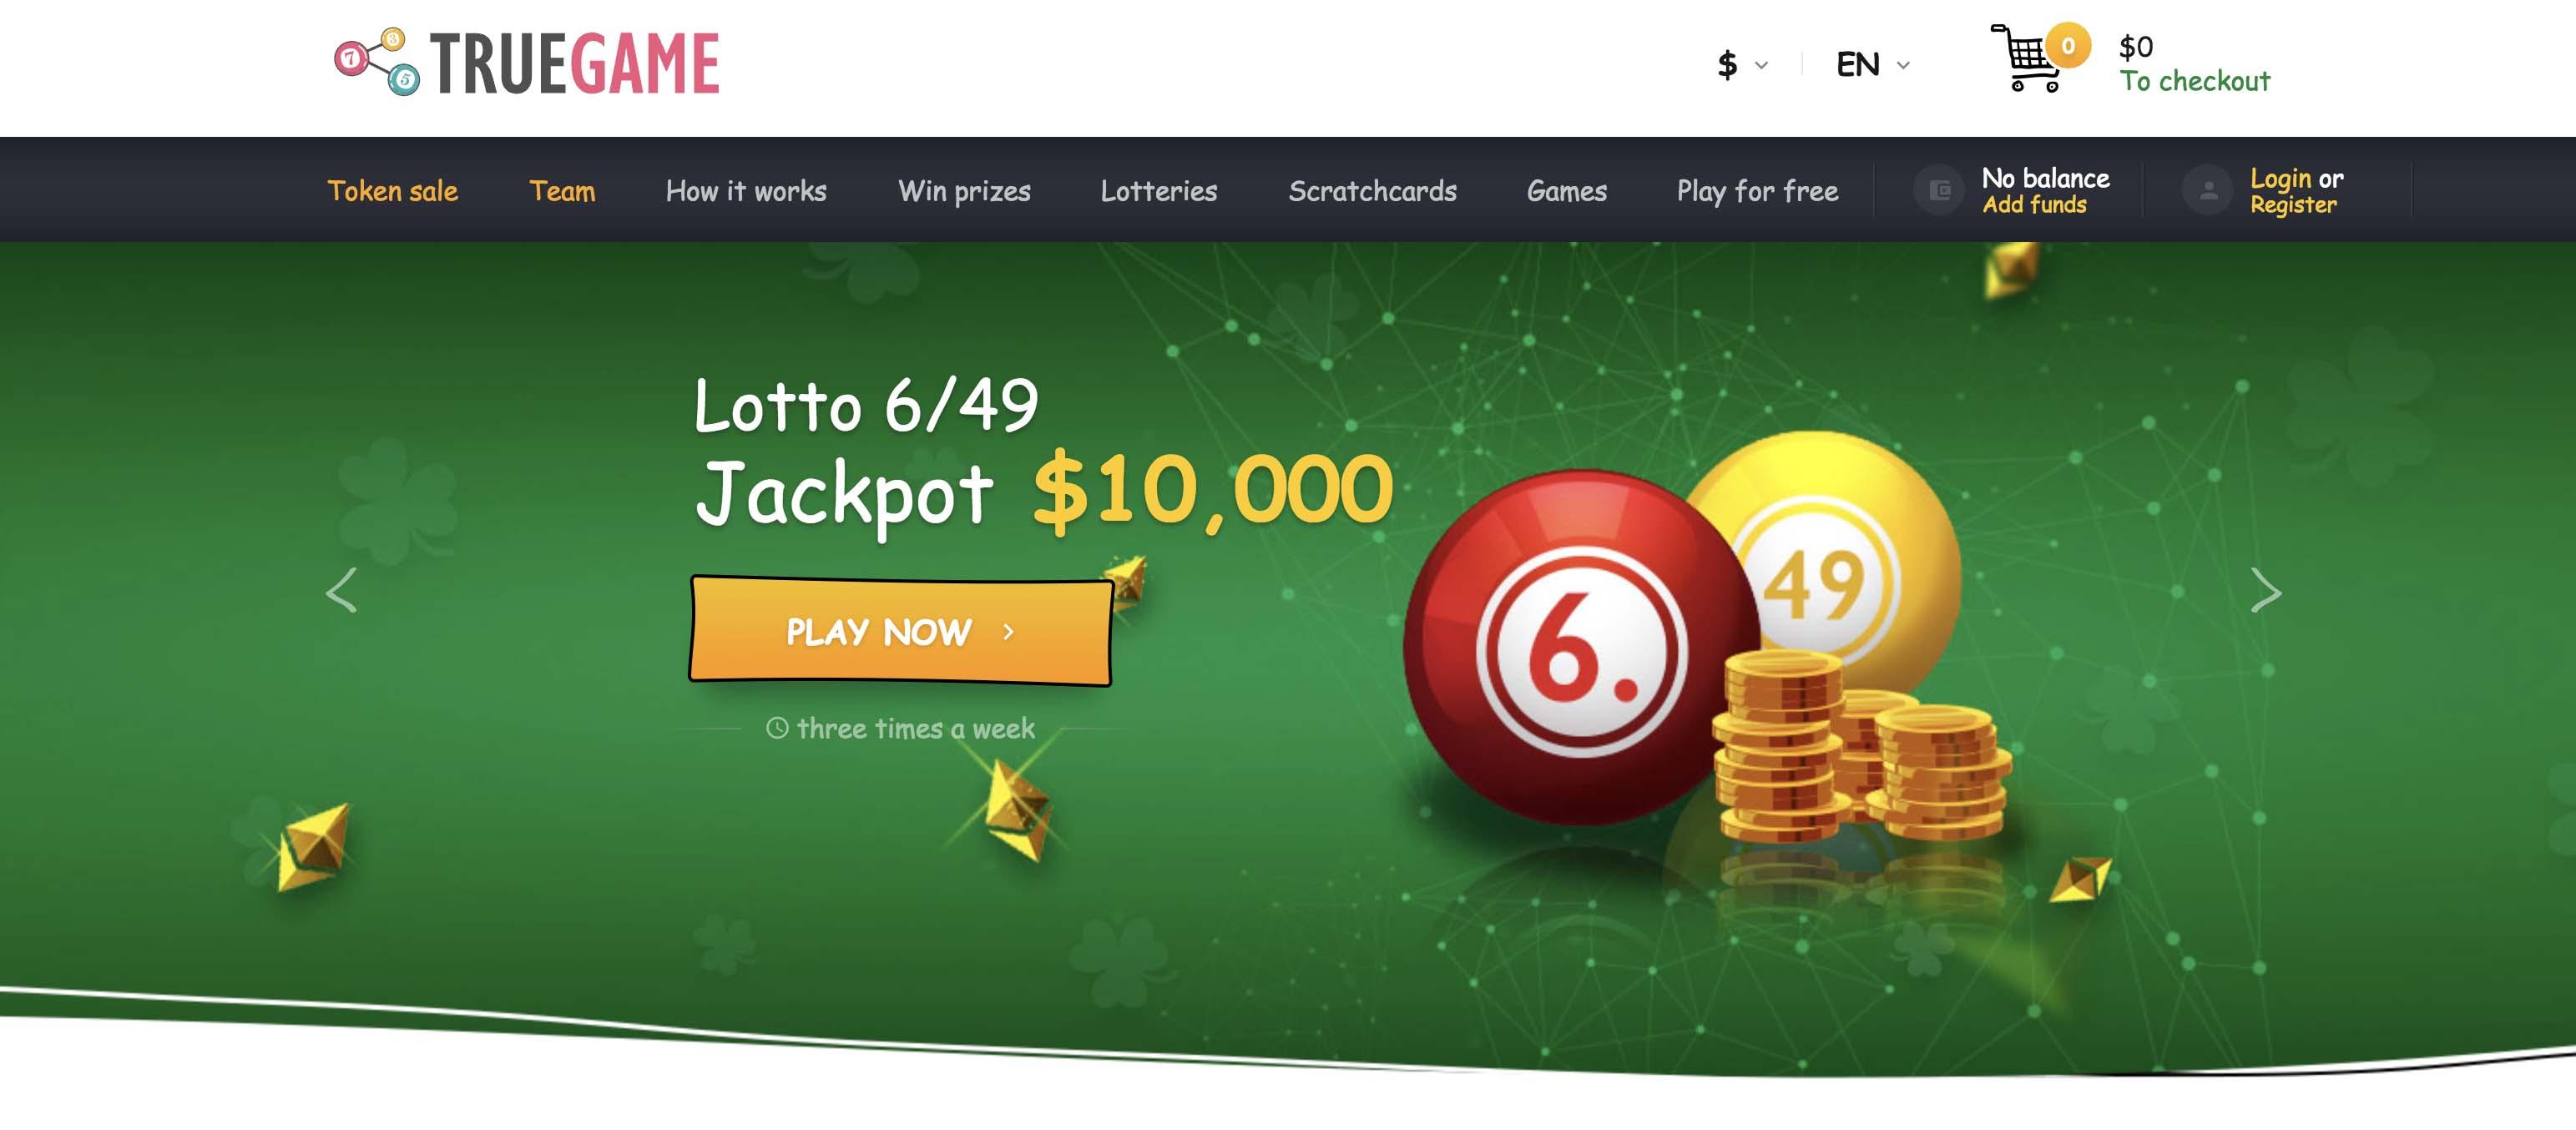 Truegame Casino